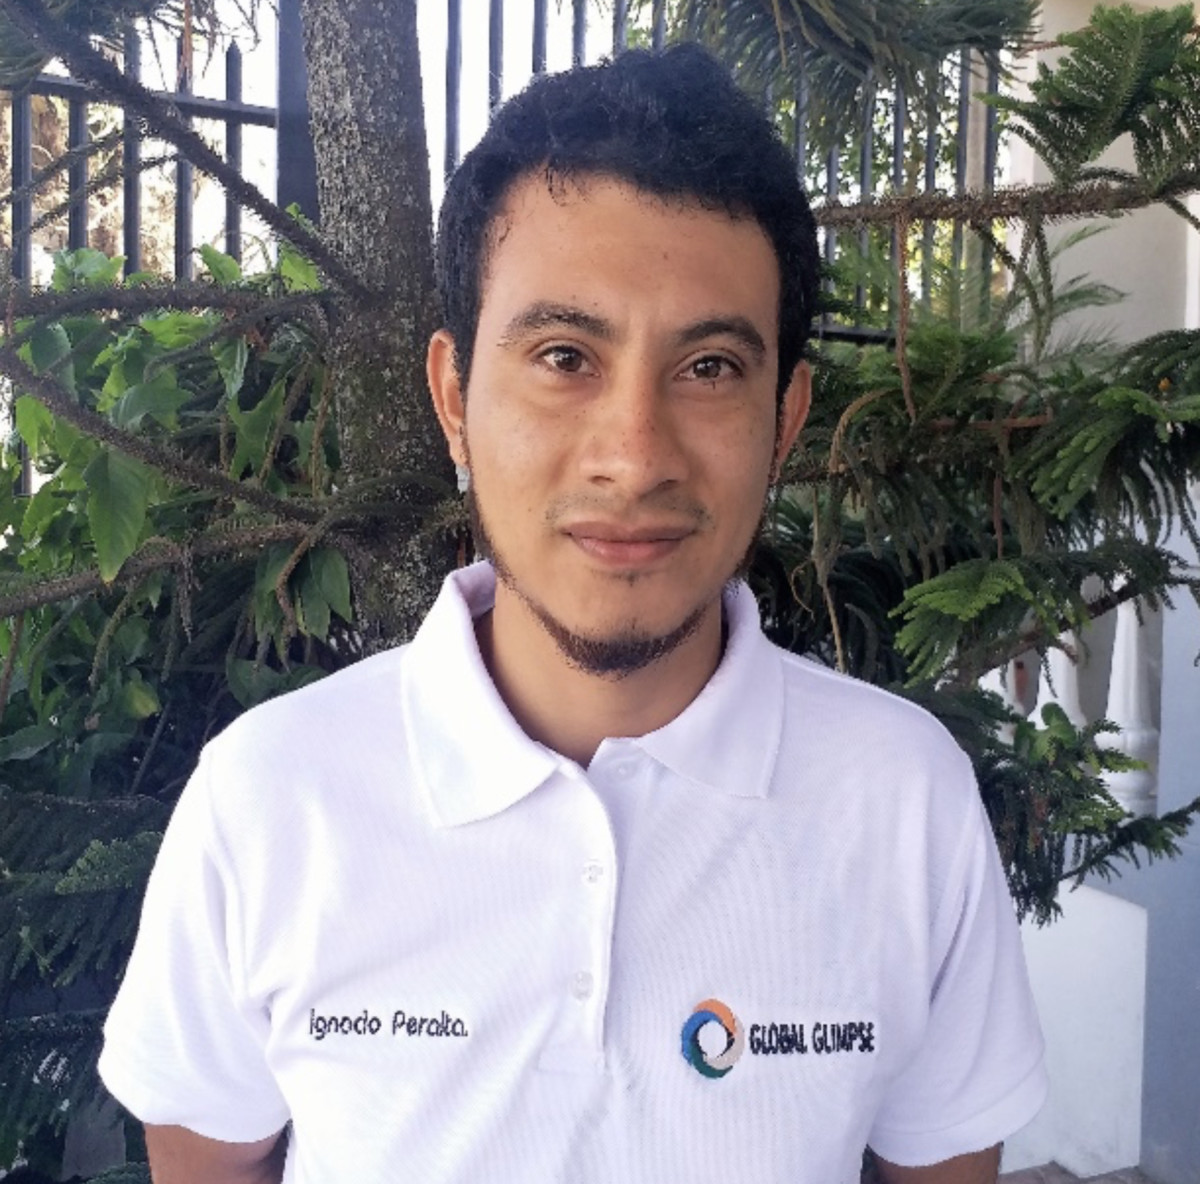 Global Glimpse Team - Ignacio Peralta